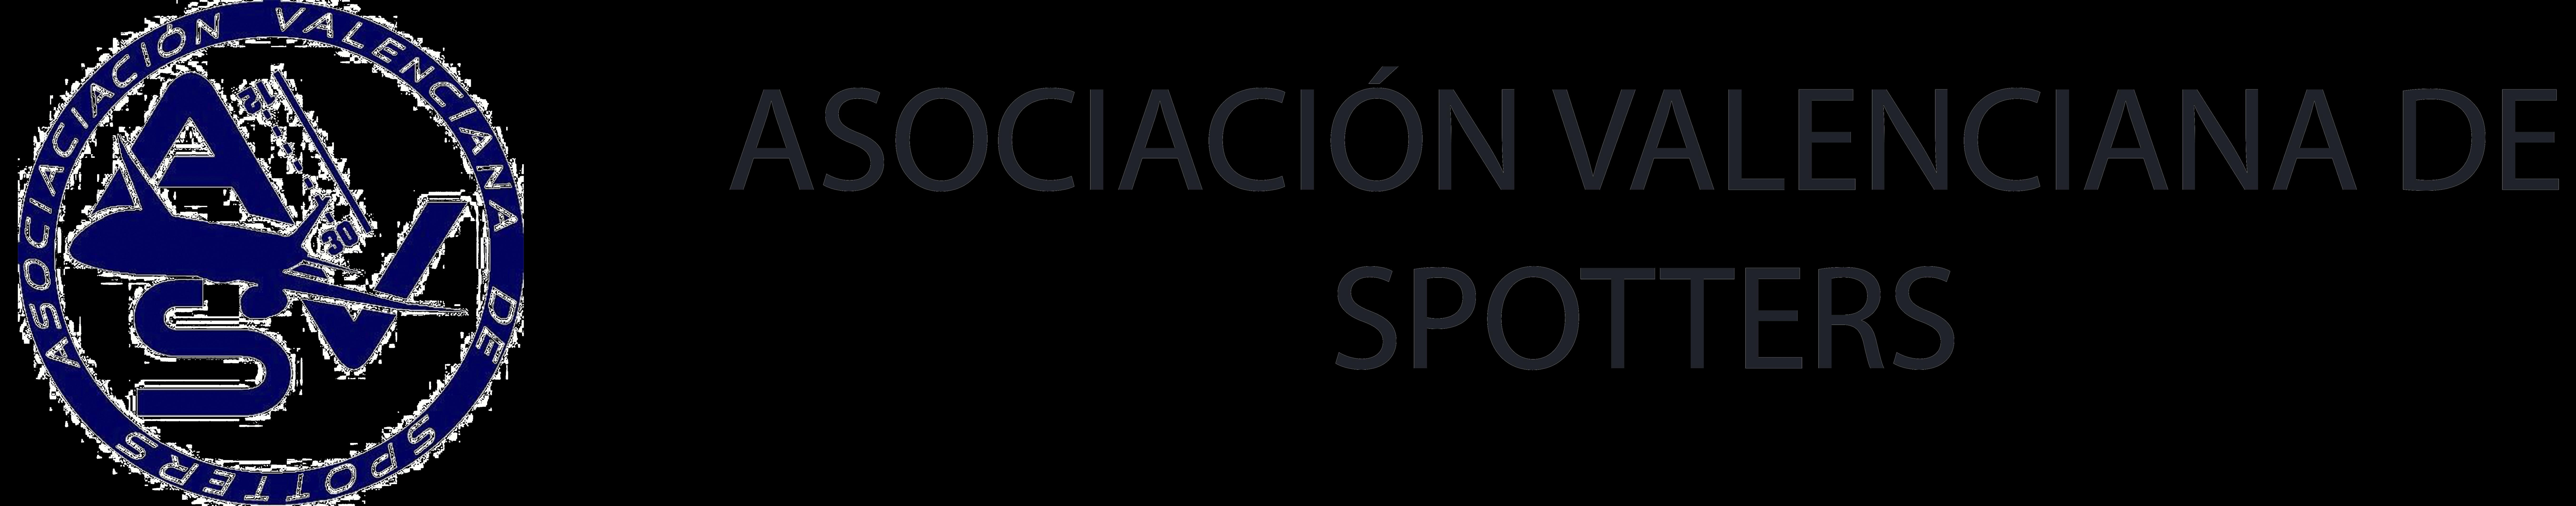 Asociación Valenciana de Spotters